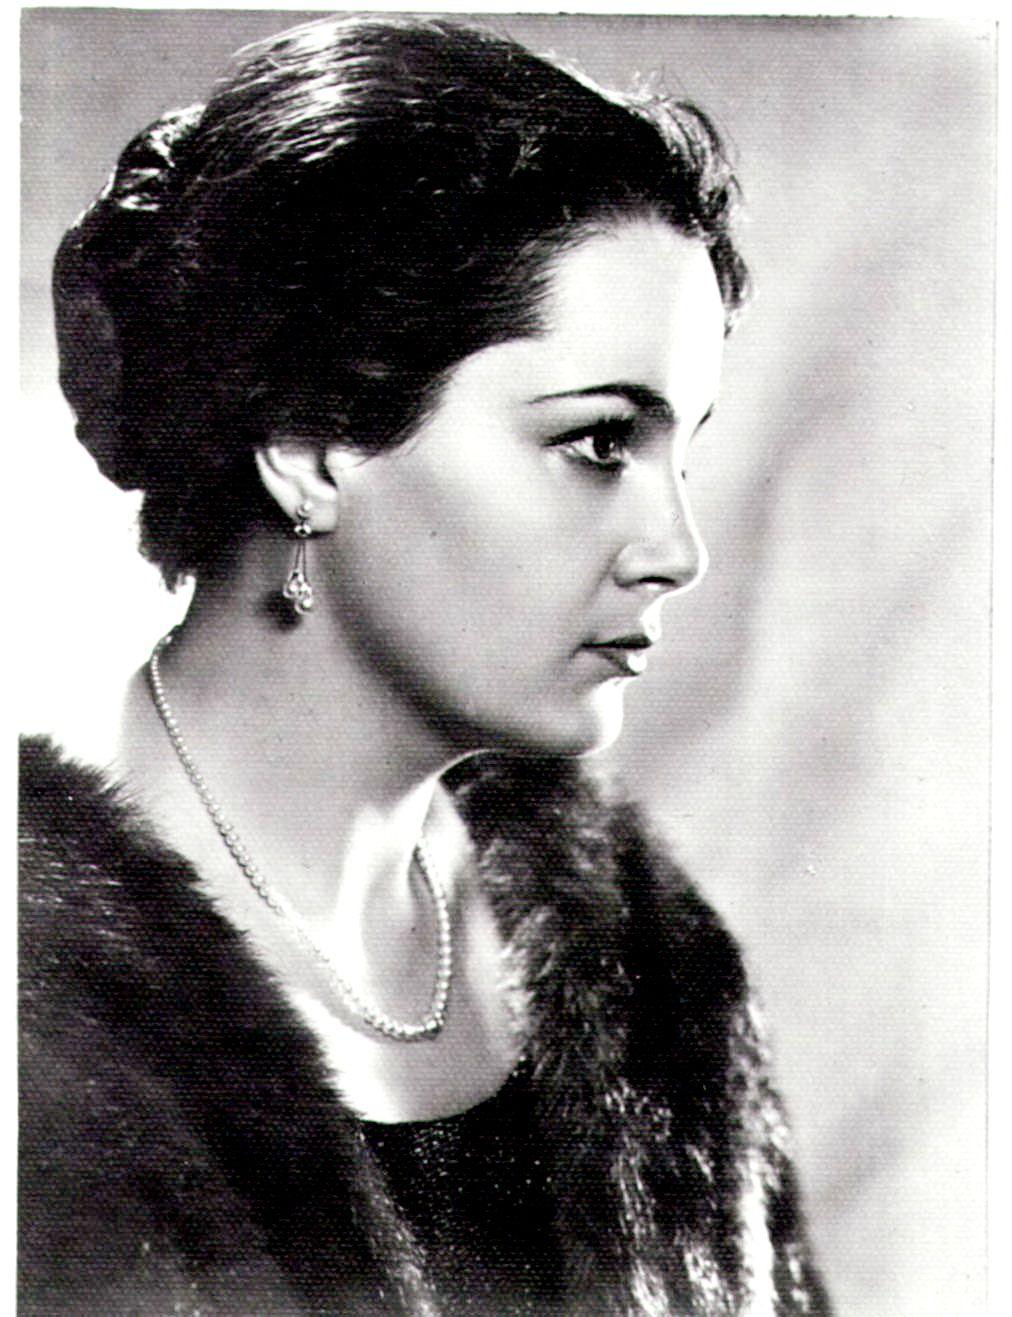 Olga Bgan - actress of the USSR